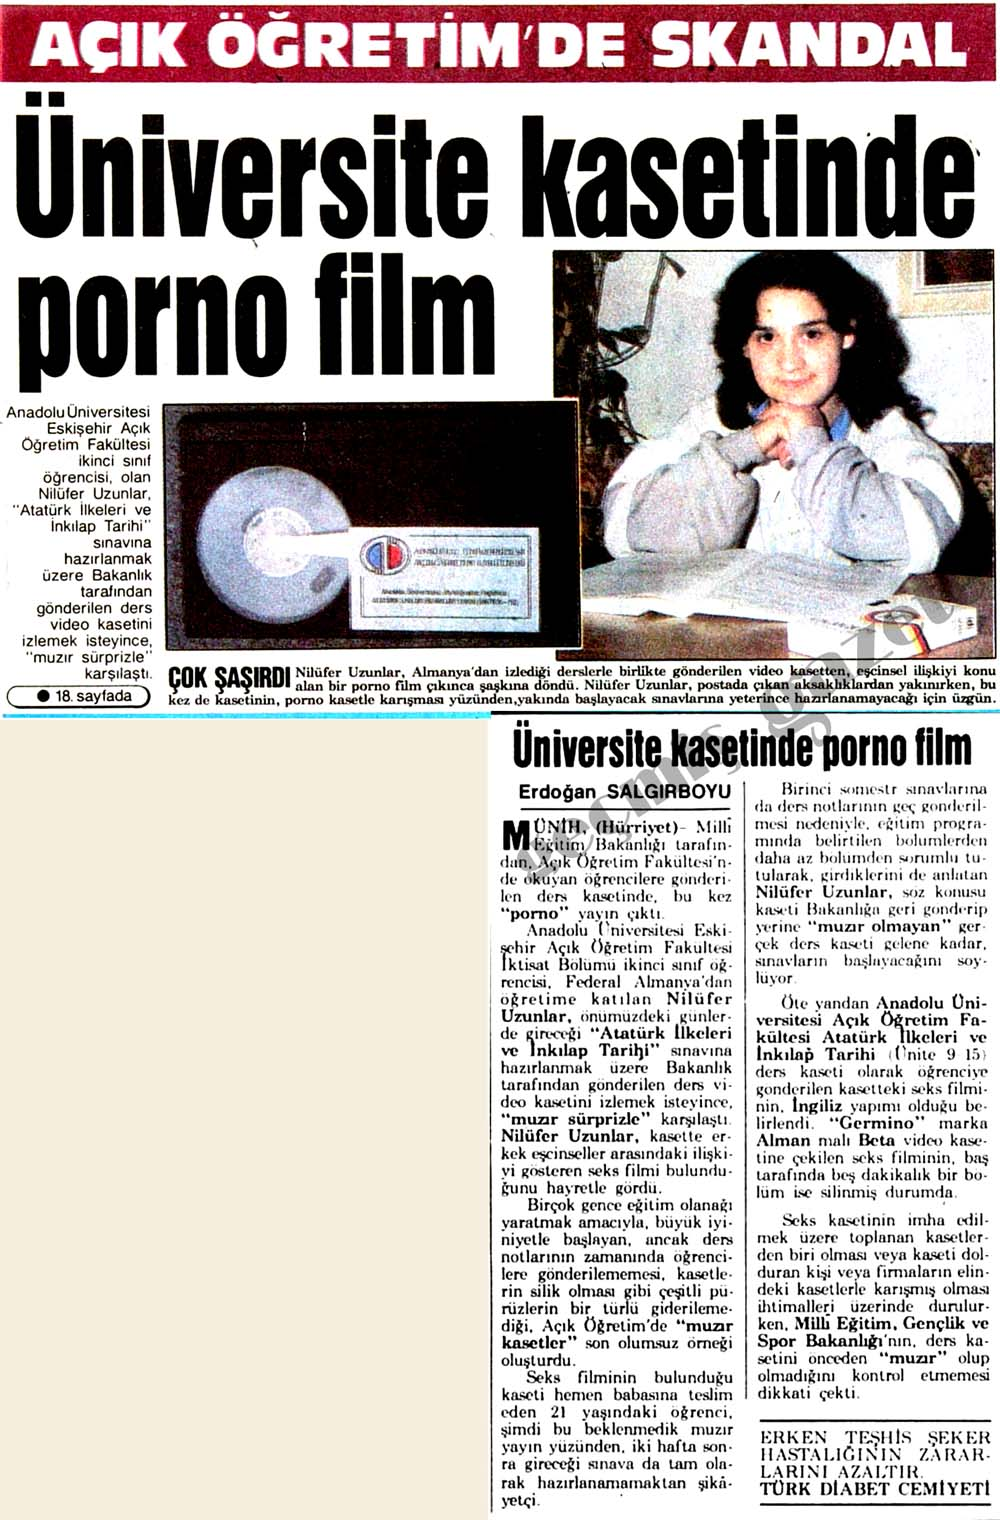 Üniversite kasetinde porno film